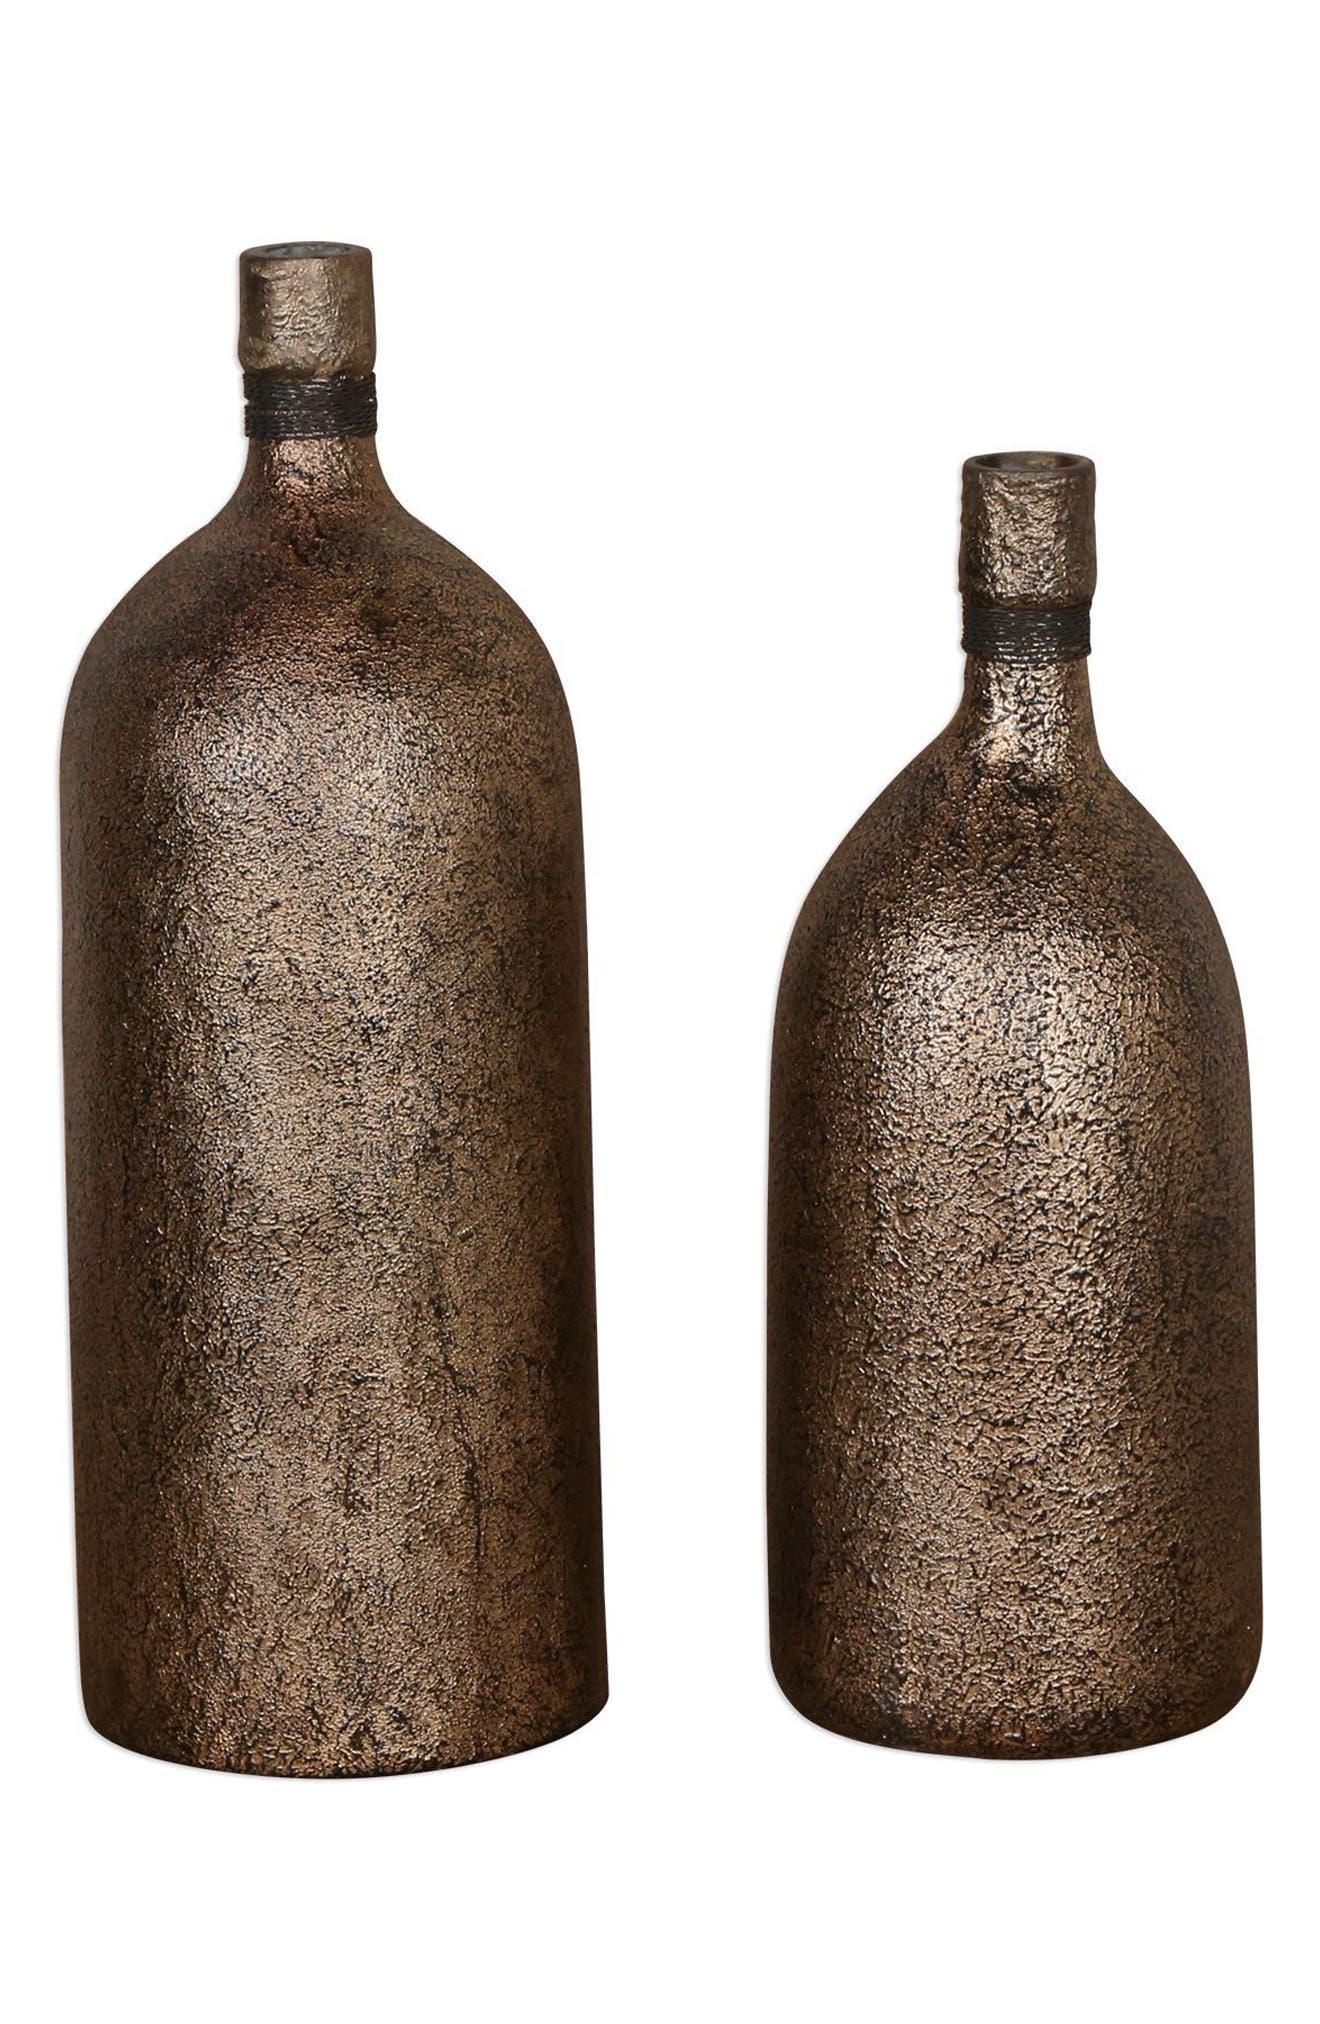 Biren Set of 2 Vases,                             Main thumbnail 1, color,                             Metallic Rust/ Copper